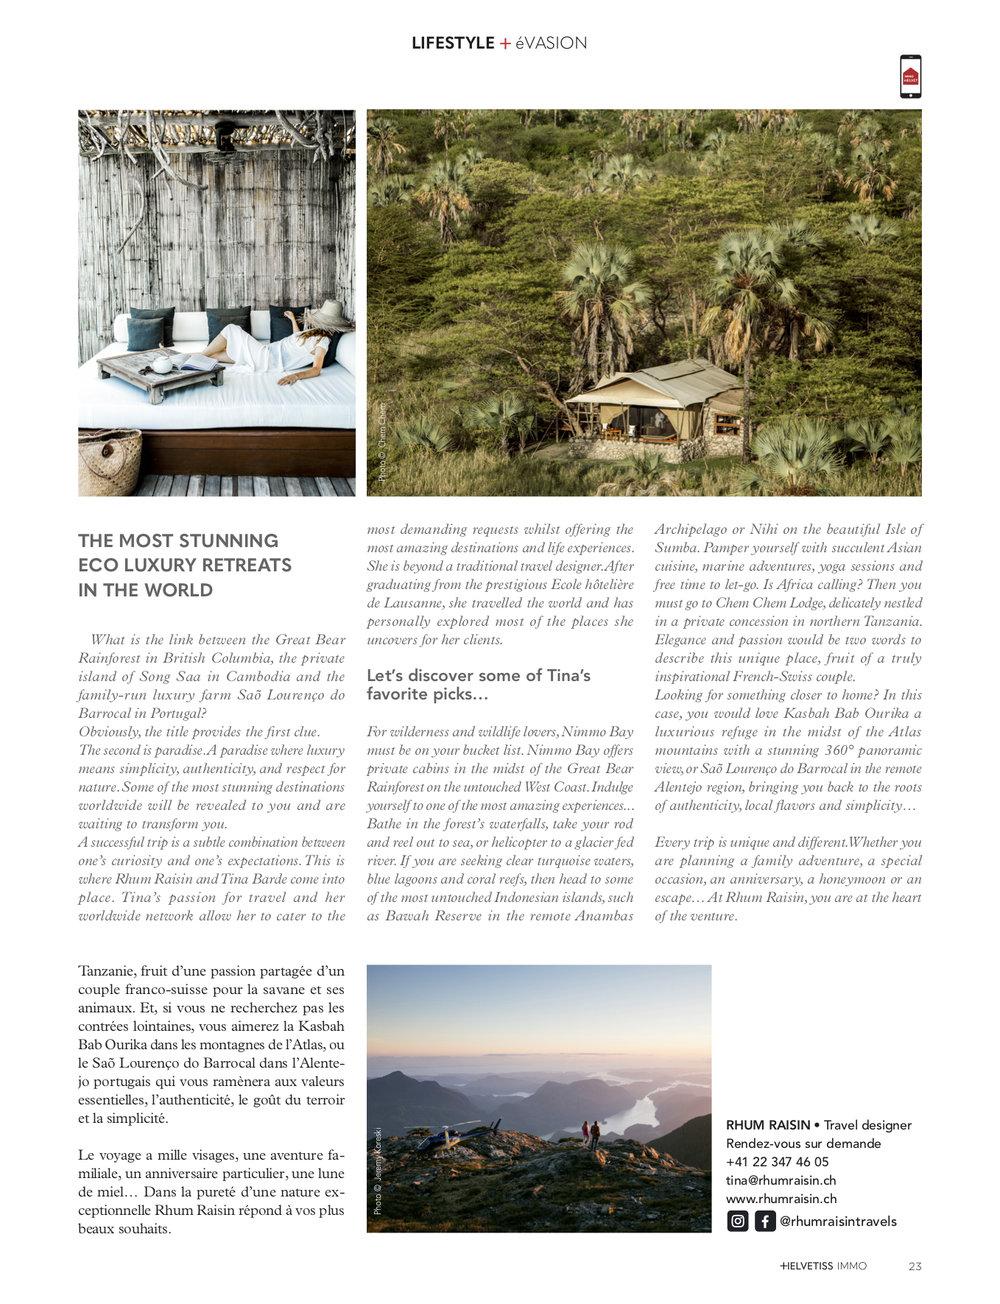 h114-Lifestyle+évasion page 2.jpg